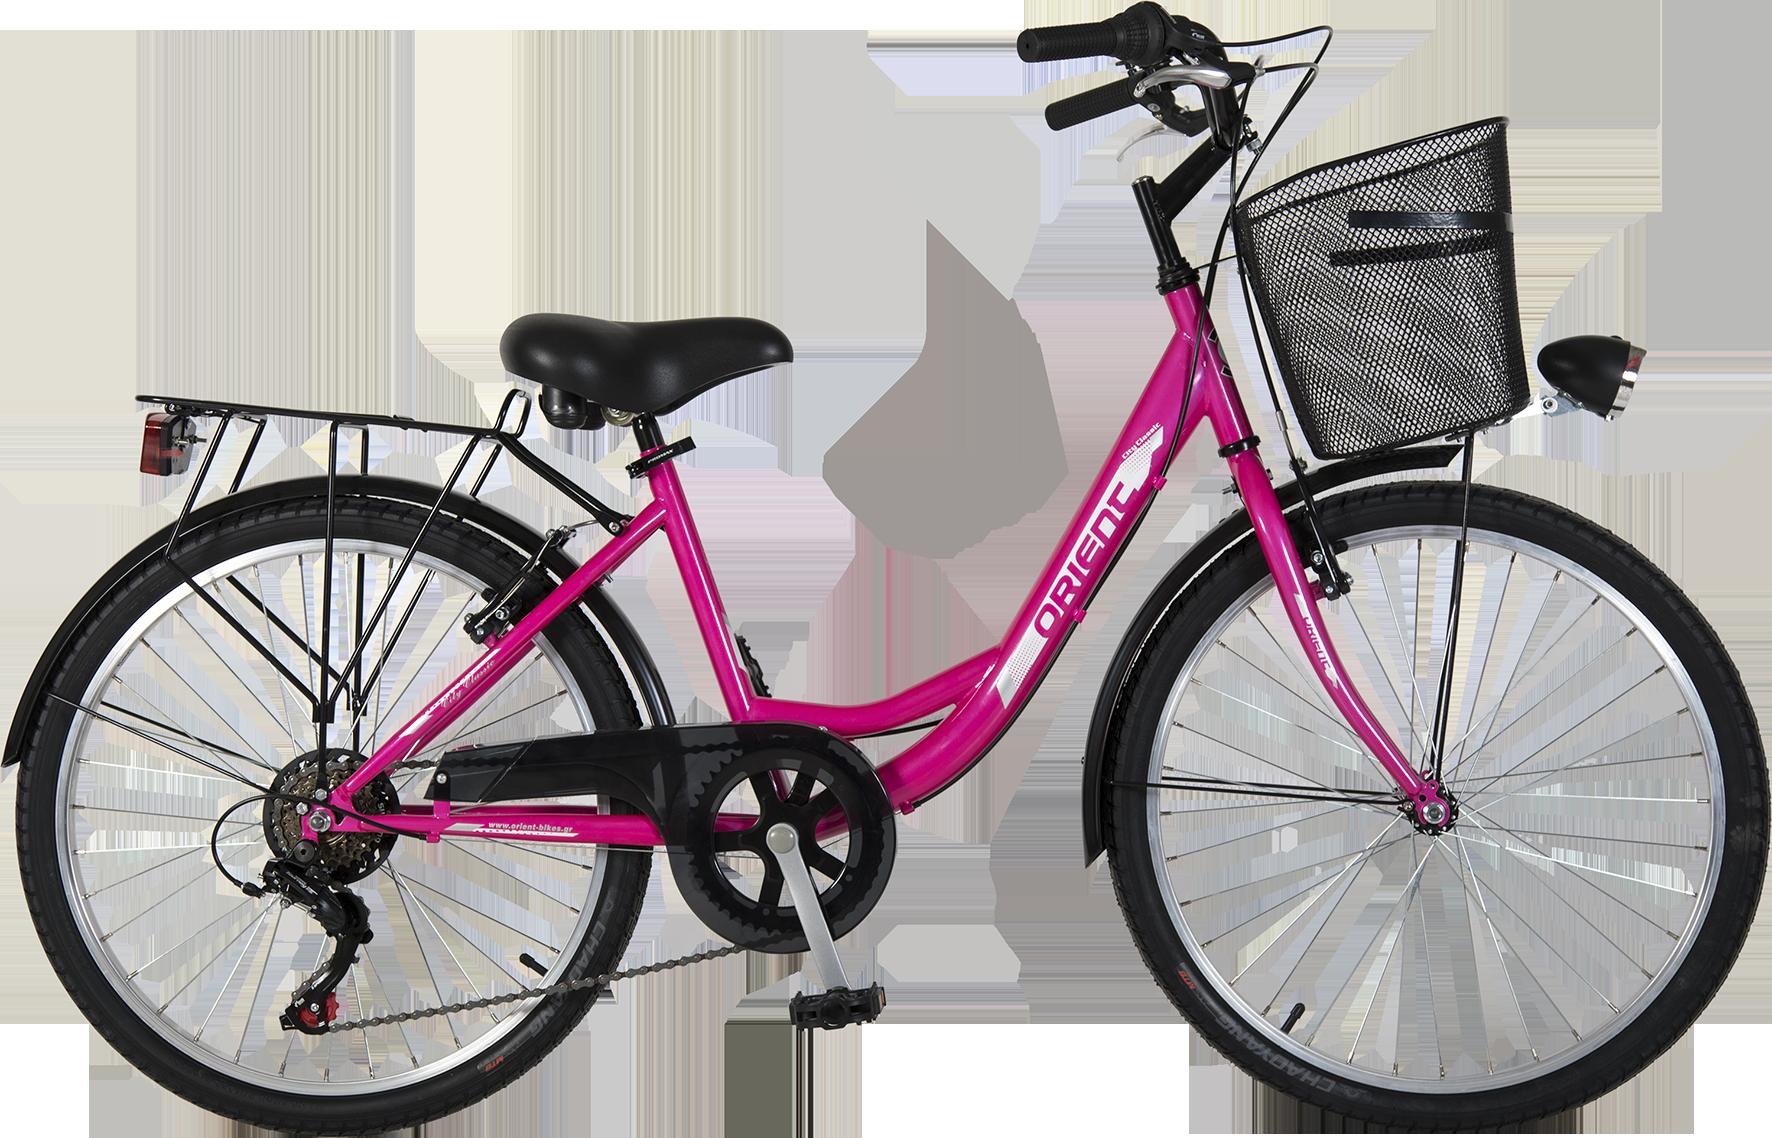 CITY 24″ girl 6sp. bike image